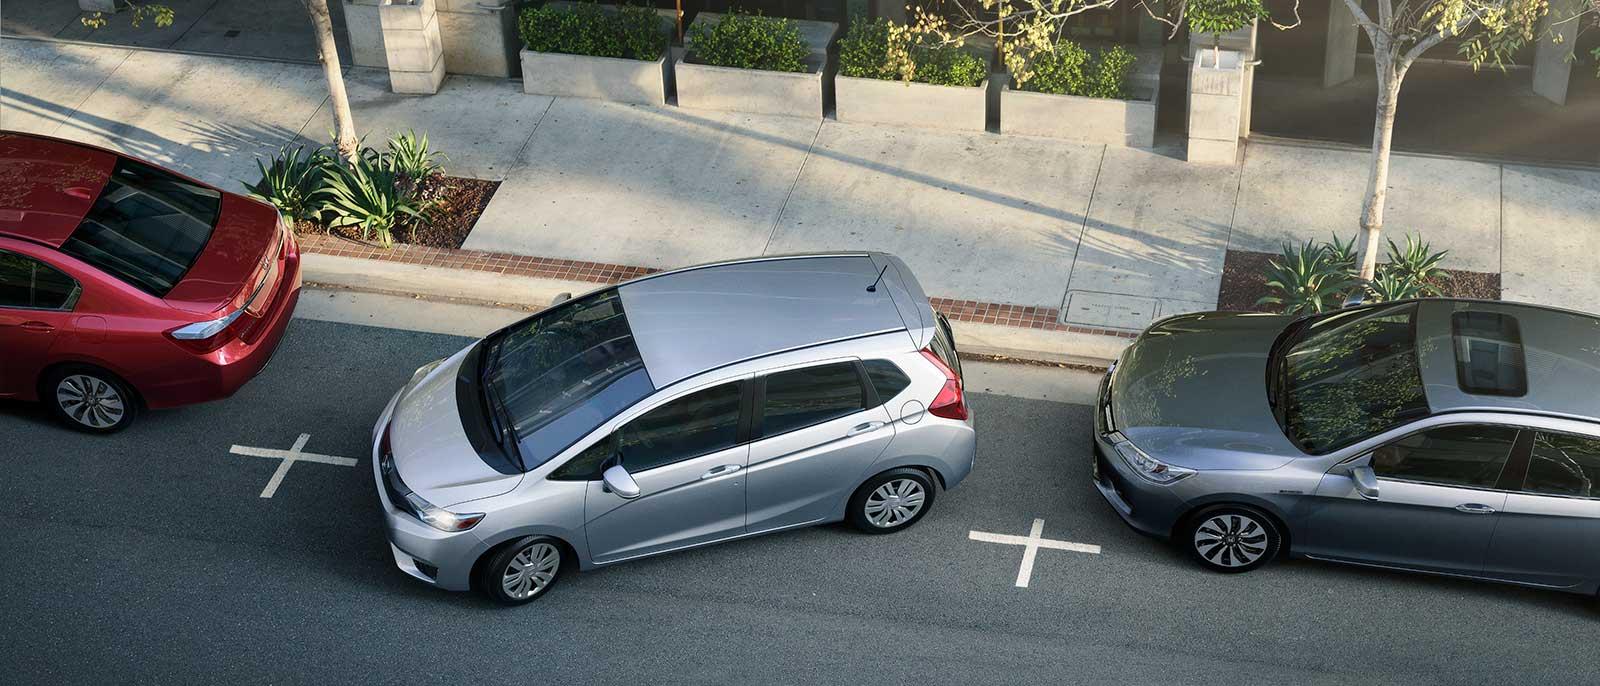 2015 Honda Fit Compact Parking